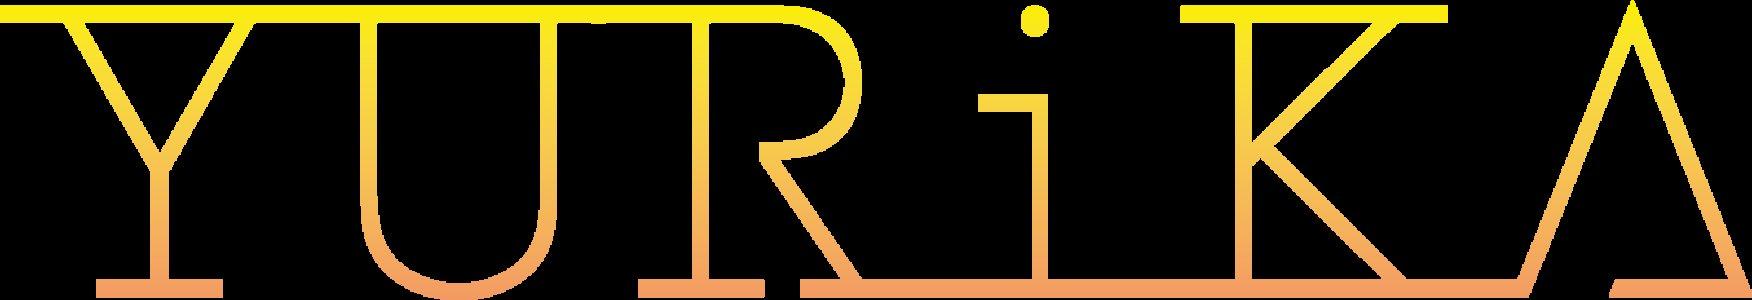 TVアニメ「BEASTARS」エンディングテーマ発売記念イベント アニメイト秋葉原本館 昼の部 ミニライブ&もふもふ2ショット撮影会